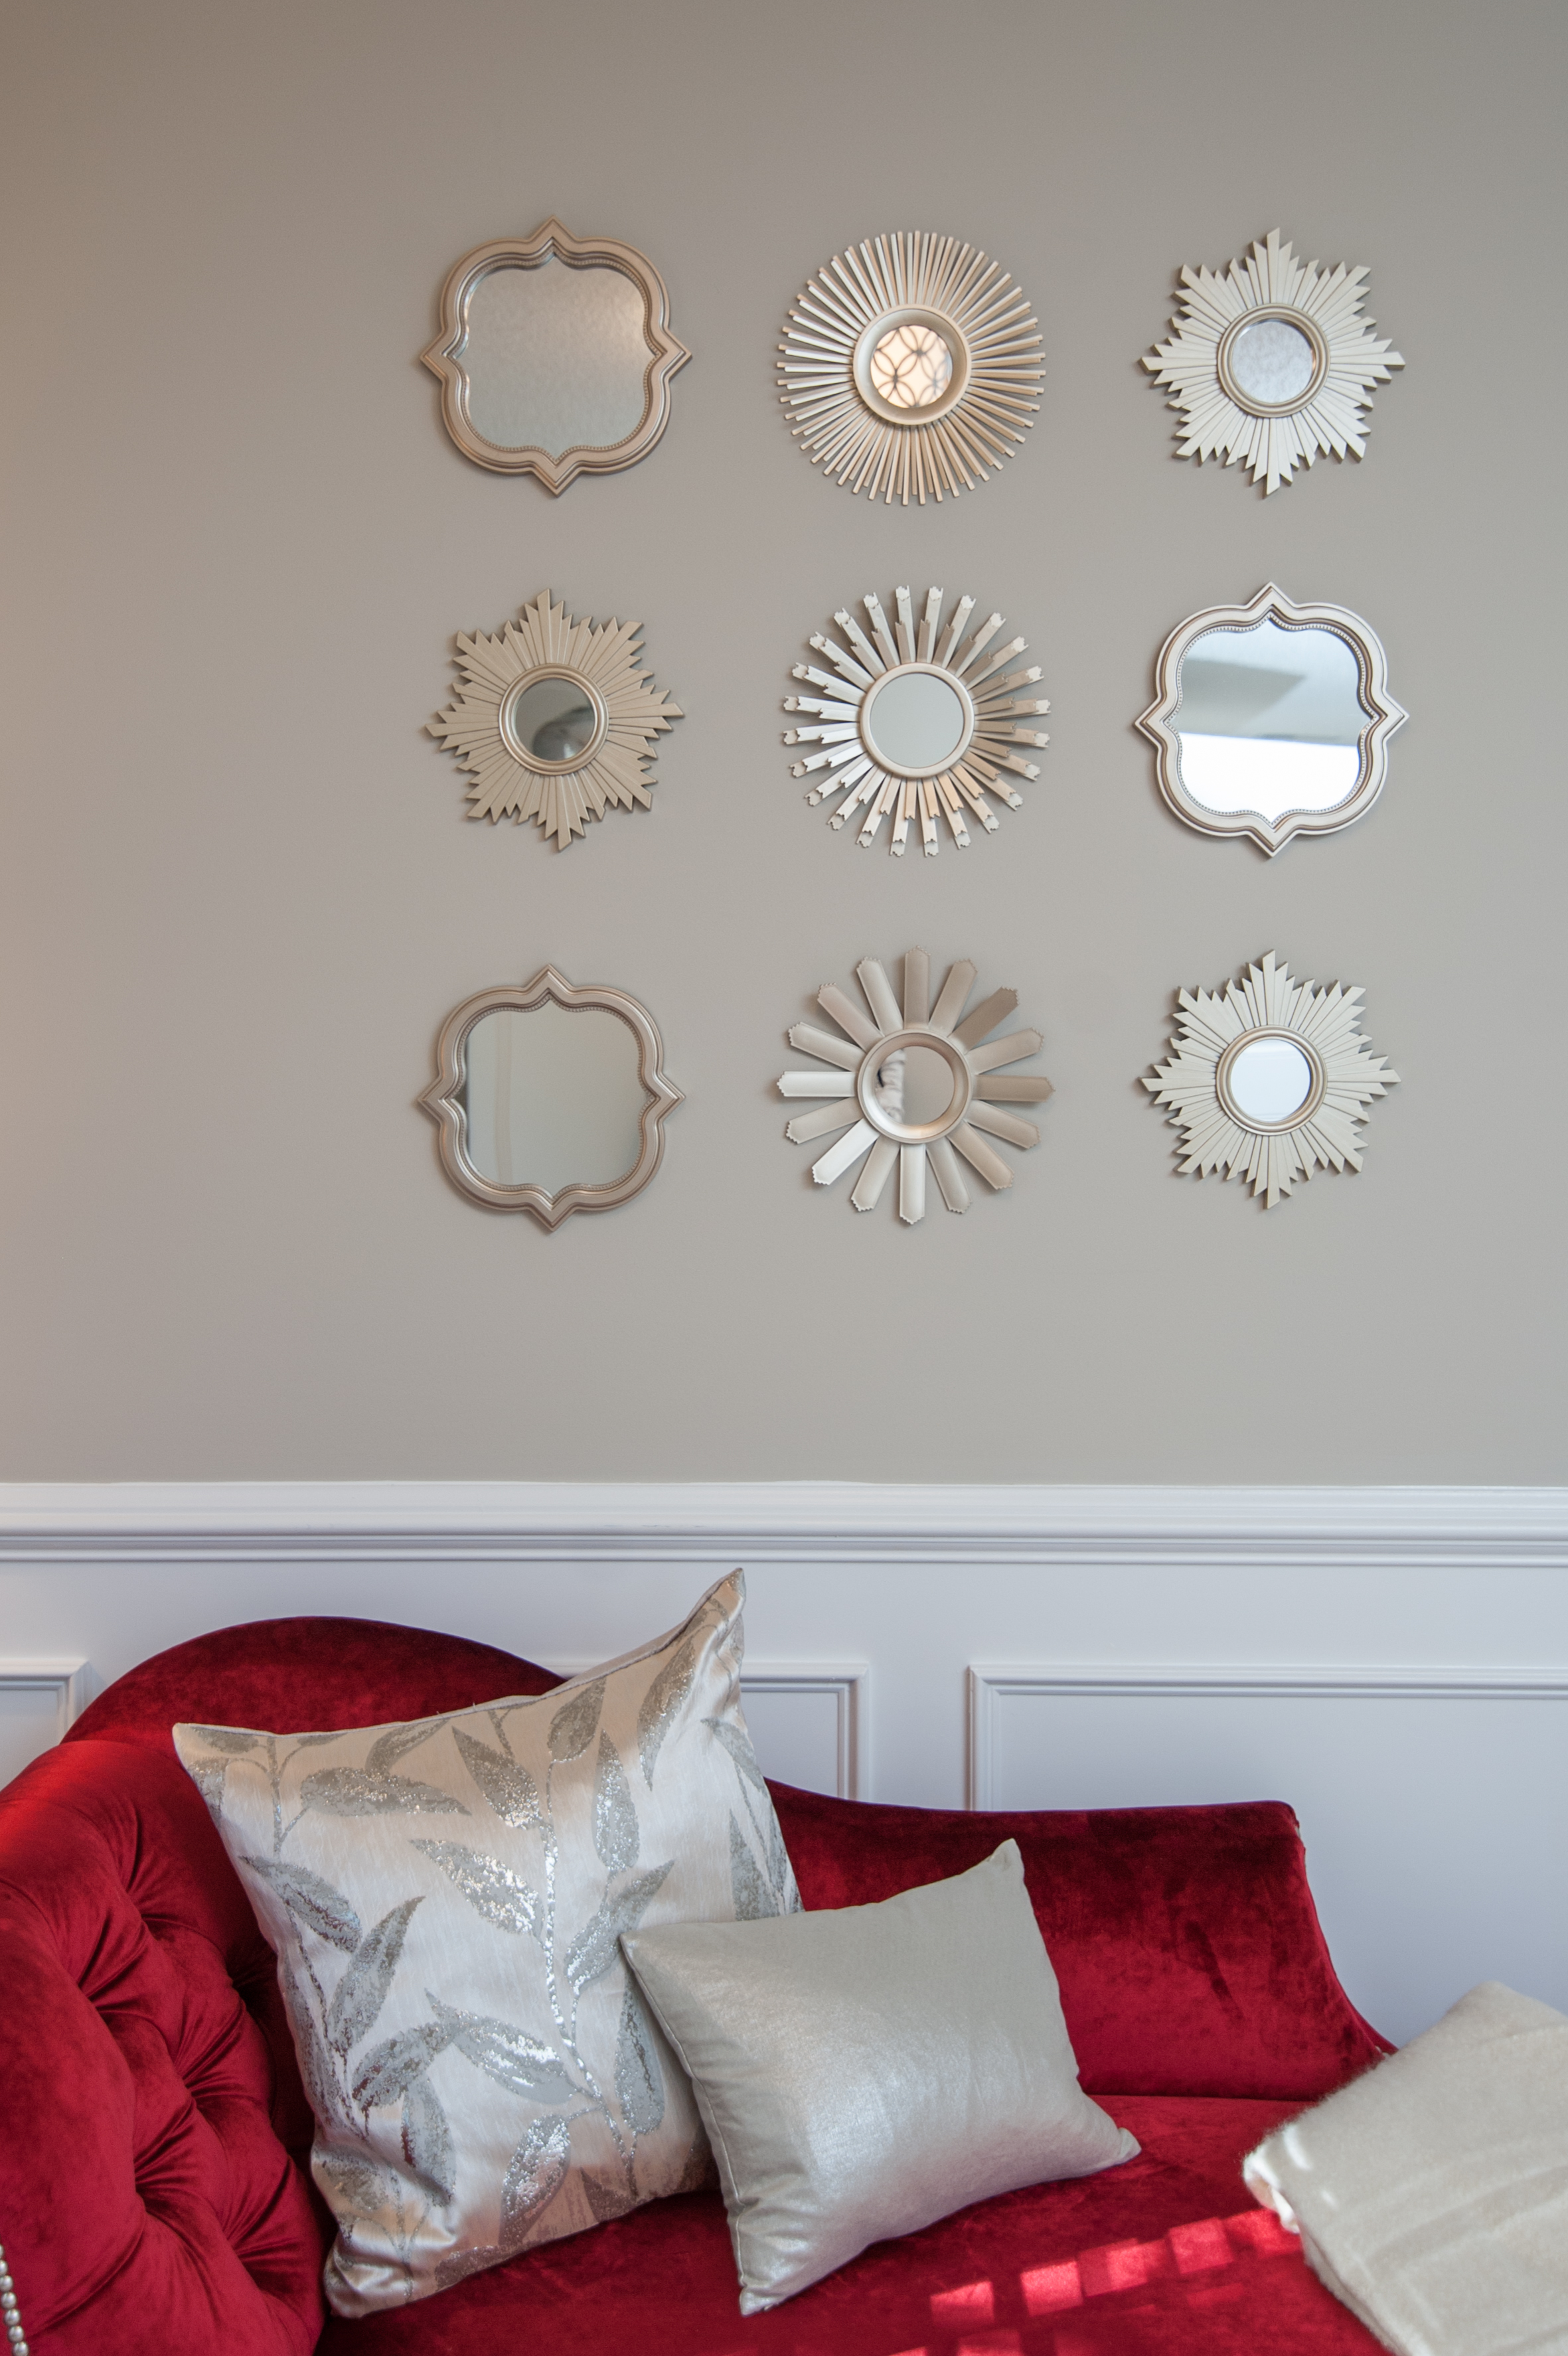 Artful Interiors - Modern Office - Mirrors